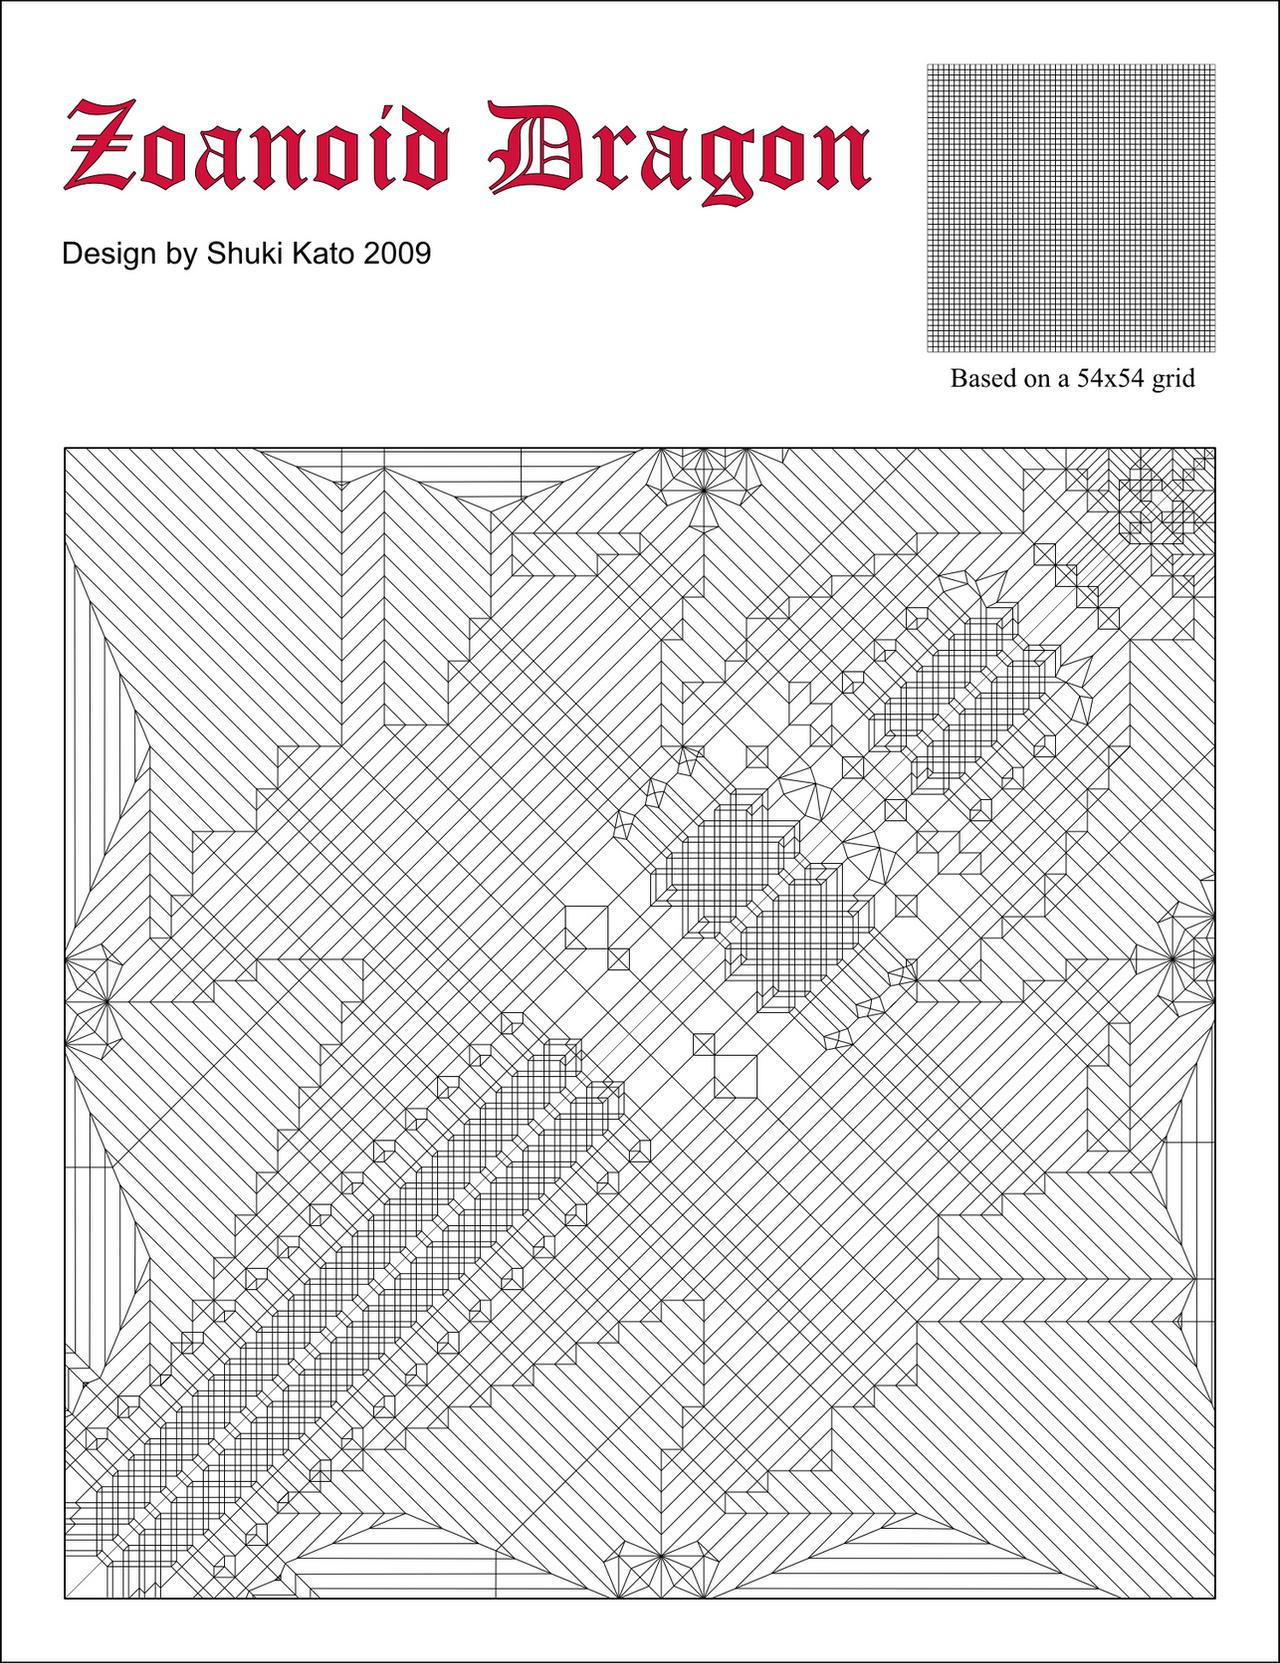 Zoanoid Dragon CP Inkscape by - 1182.6KB